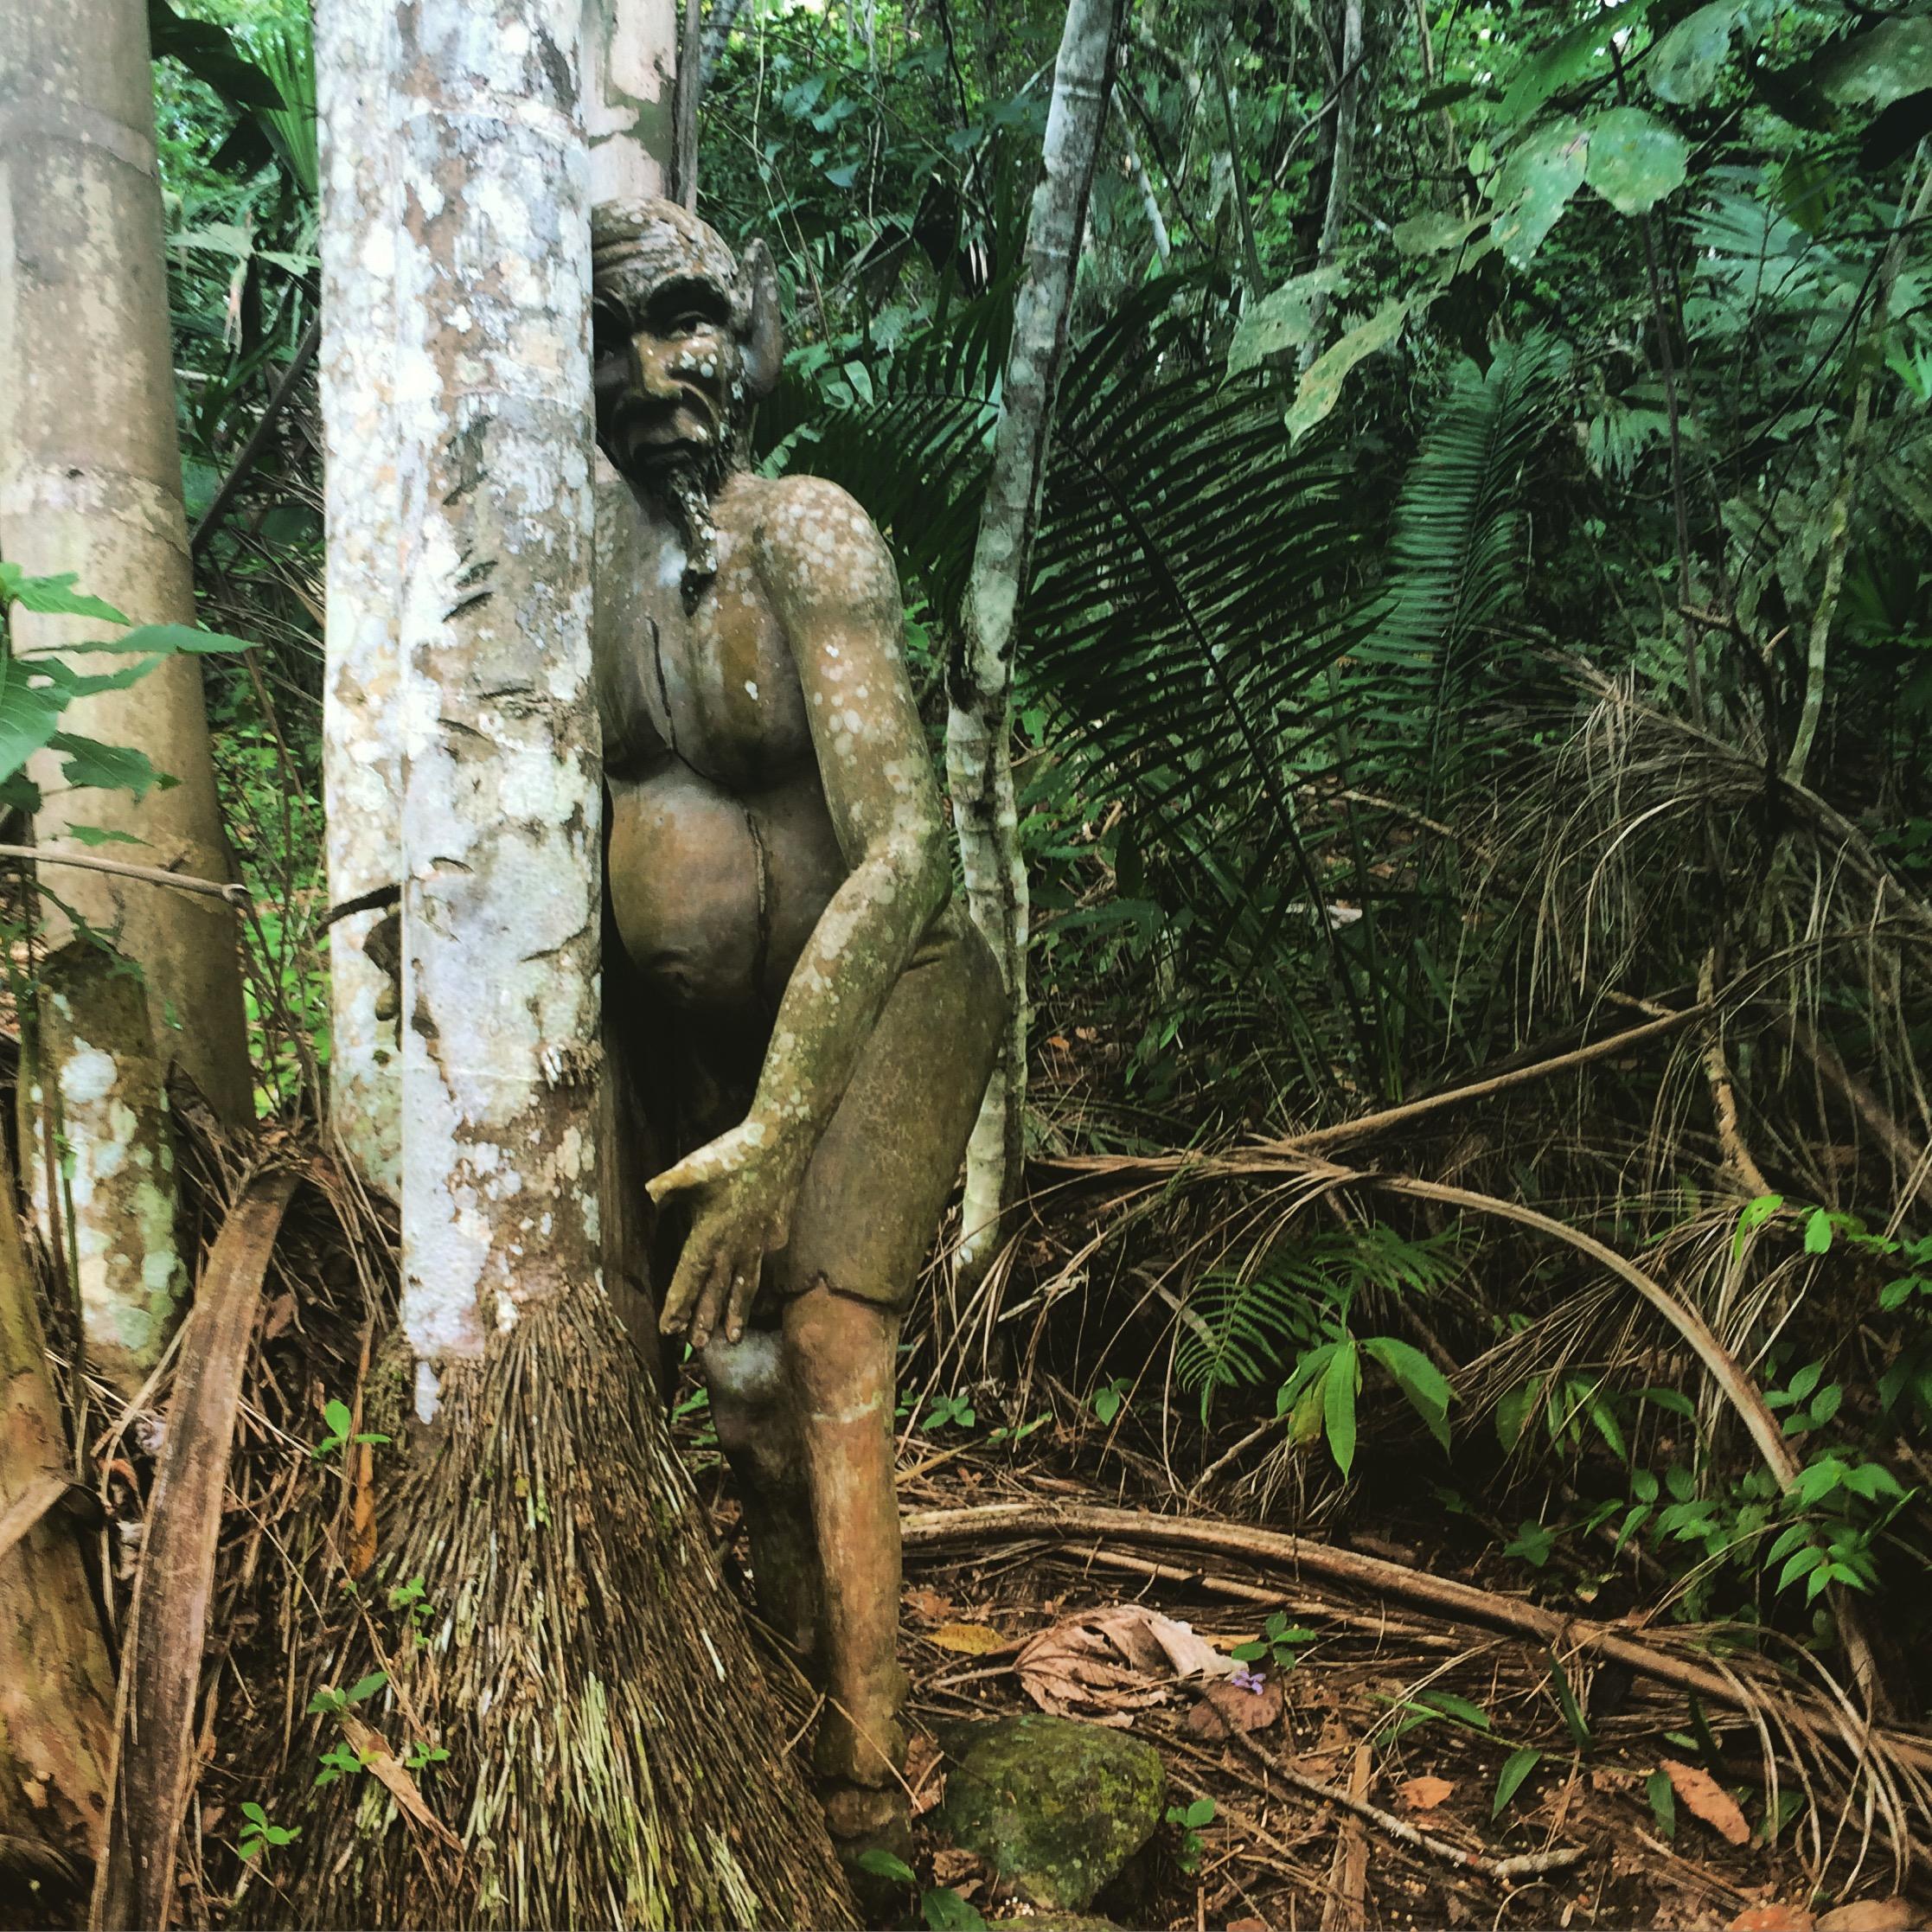 el duende • forest creeper